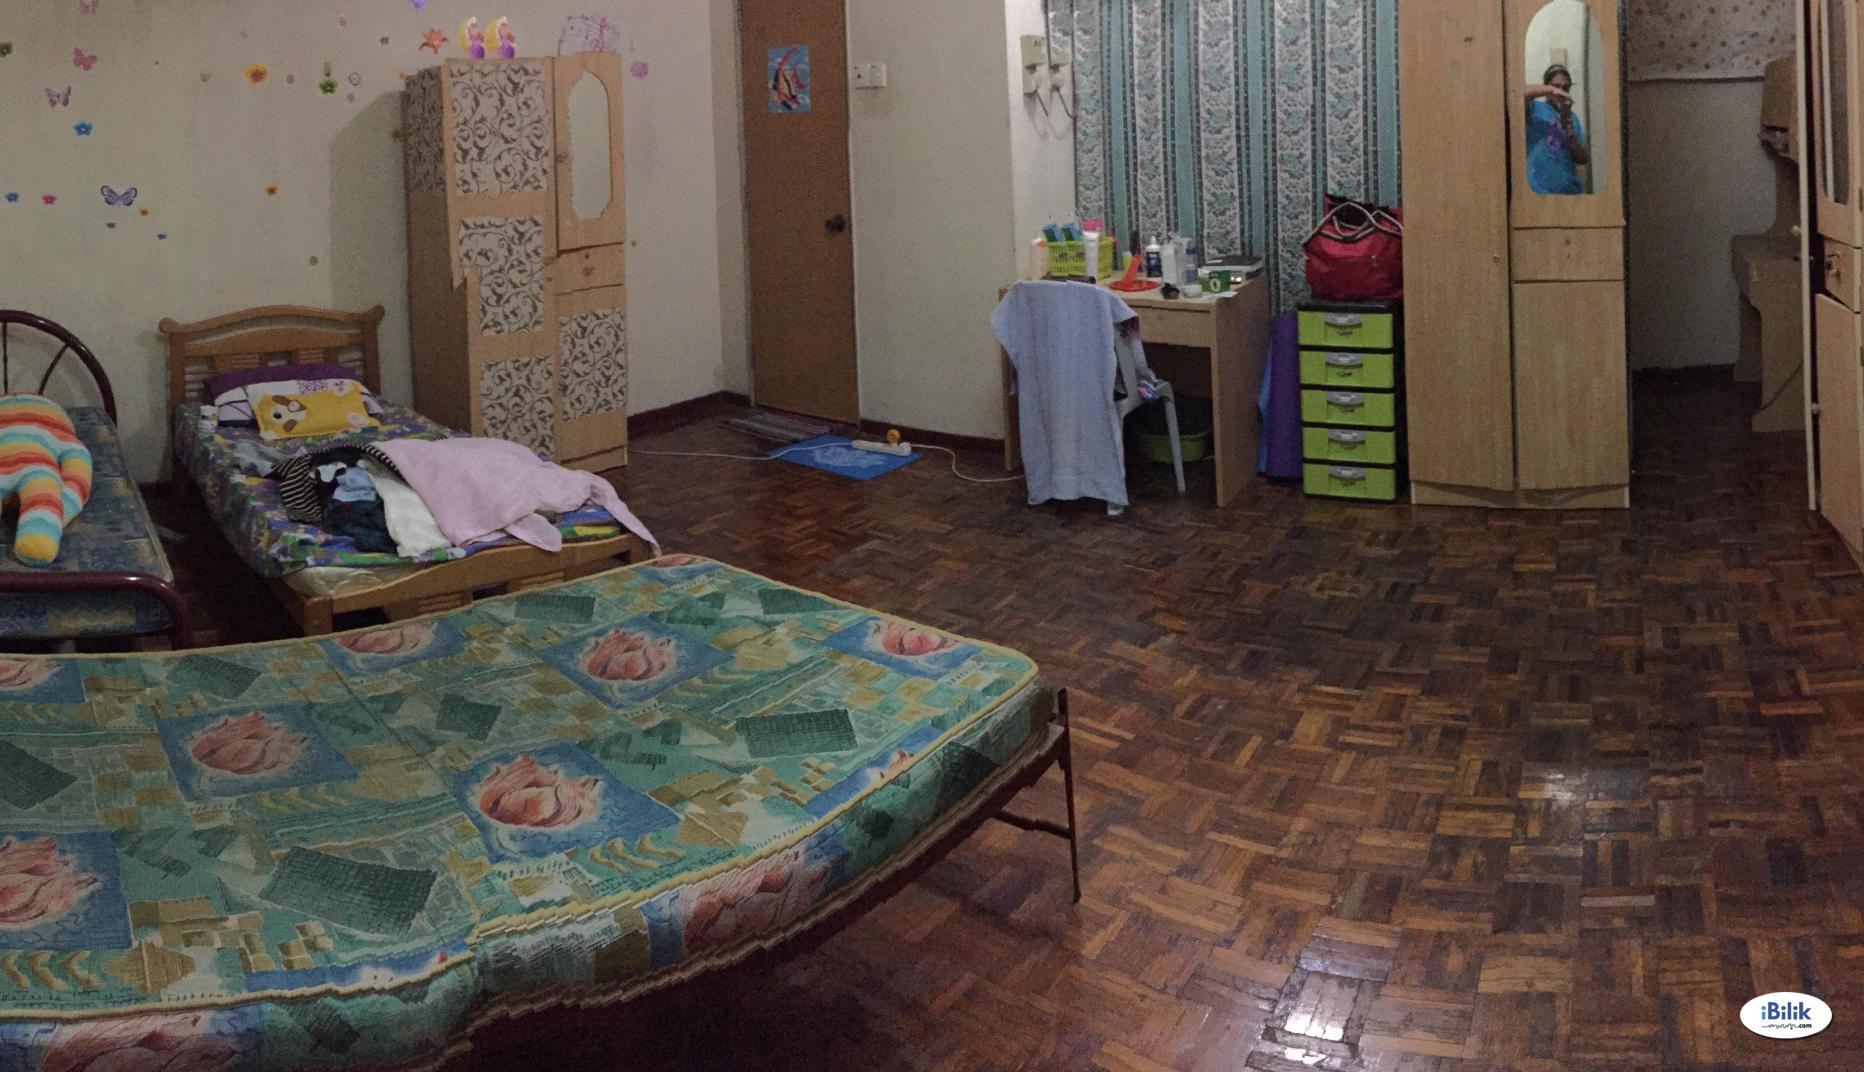 Room - Shared House at Damansara Heights, Kuala Lumpur